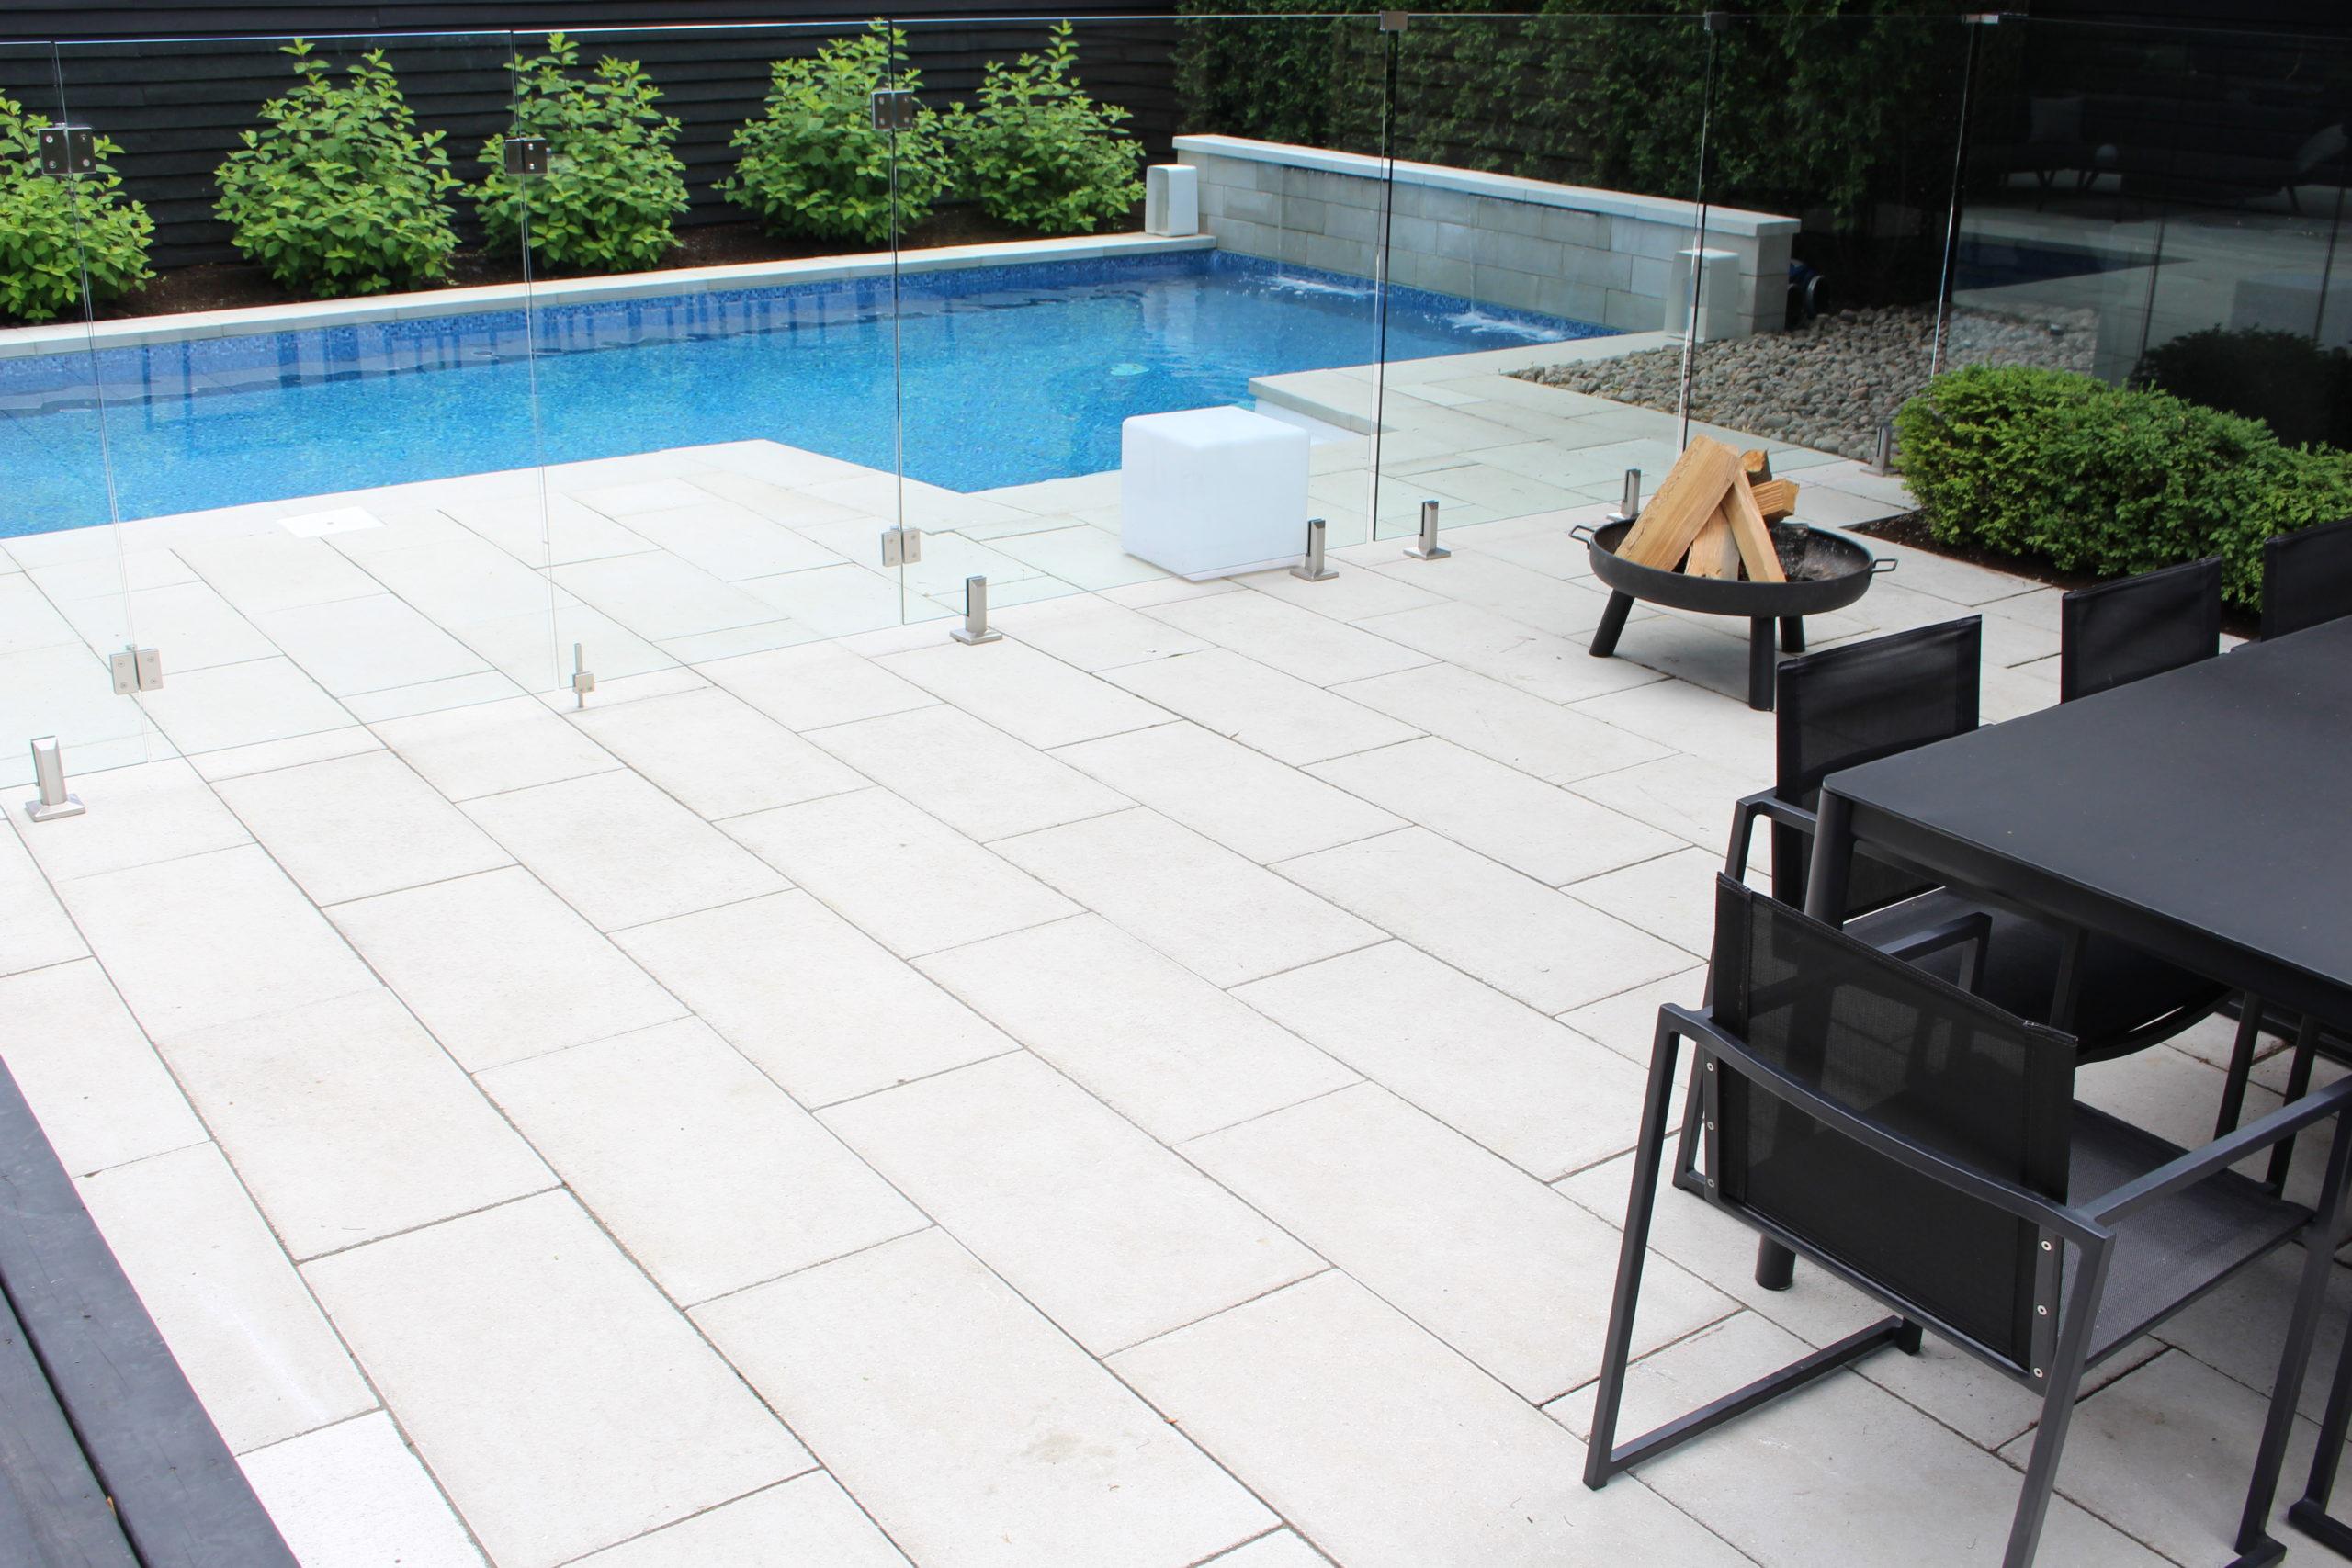 cour-arriere-08-pave-piscine